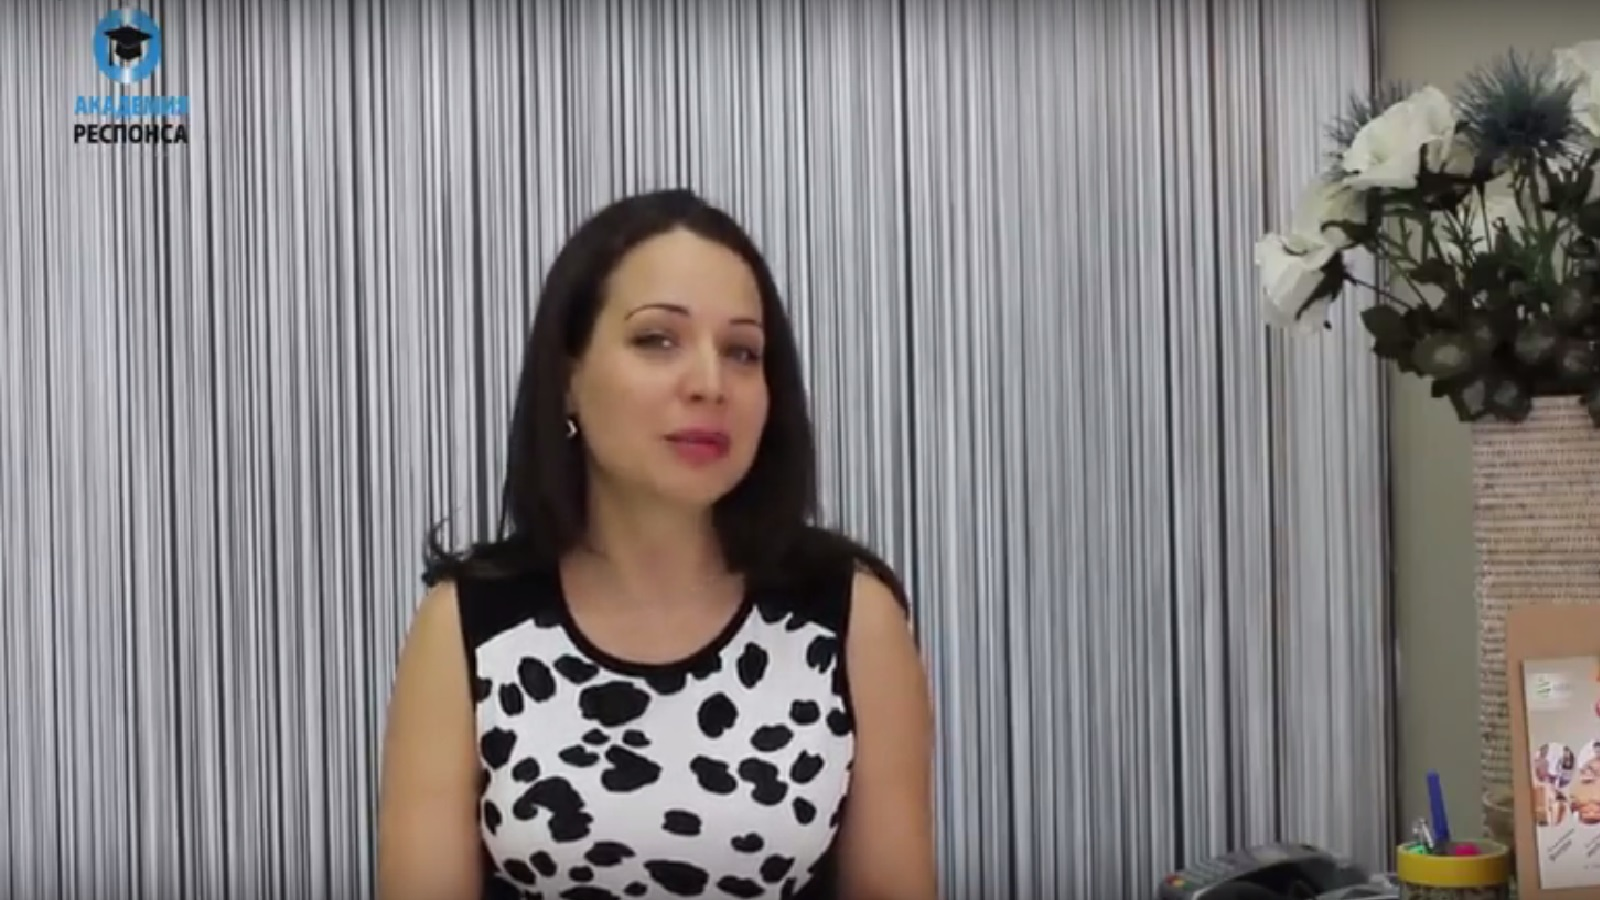 Академия Респонса – Здравословното хранене – Мода или необходимост? – 22.01.2015